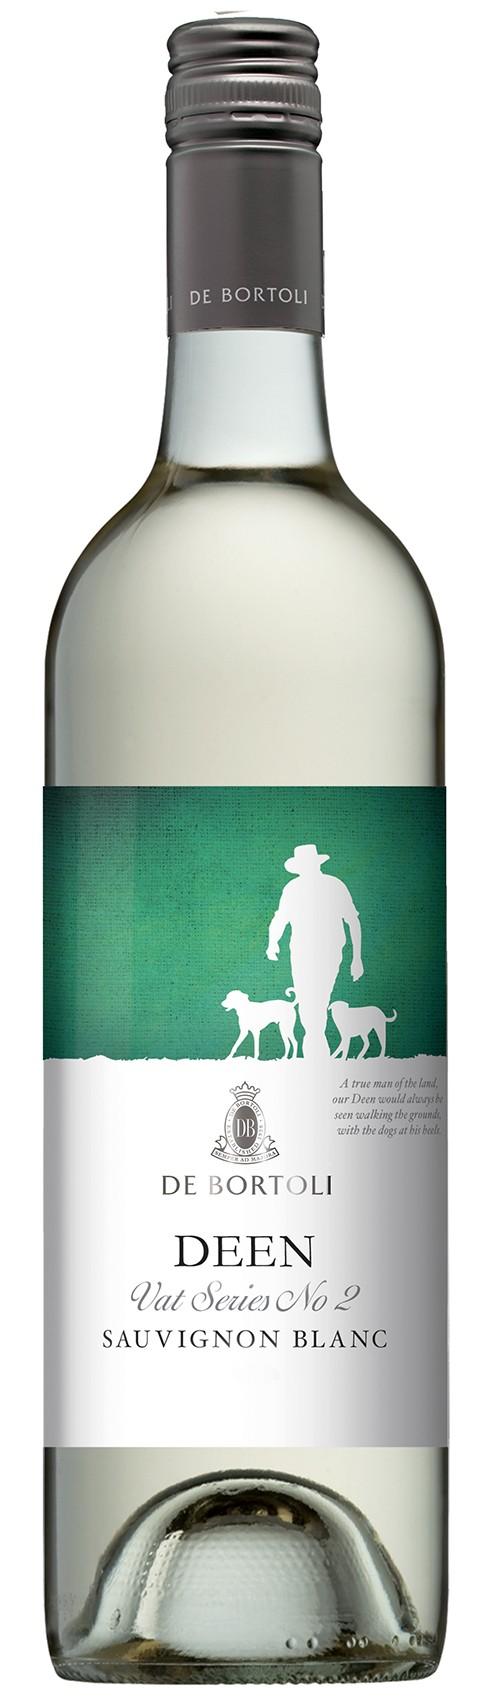 Deen De Bortoli Vat 2 Sauvignon Blanc